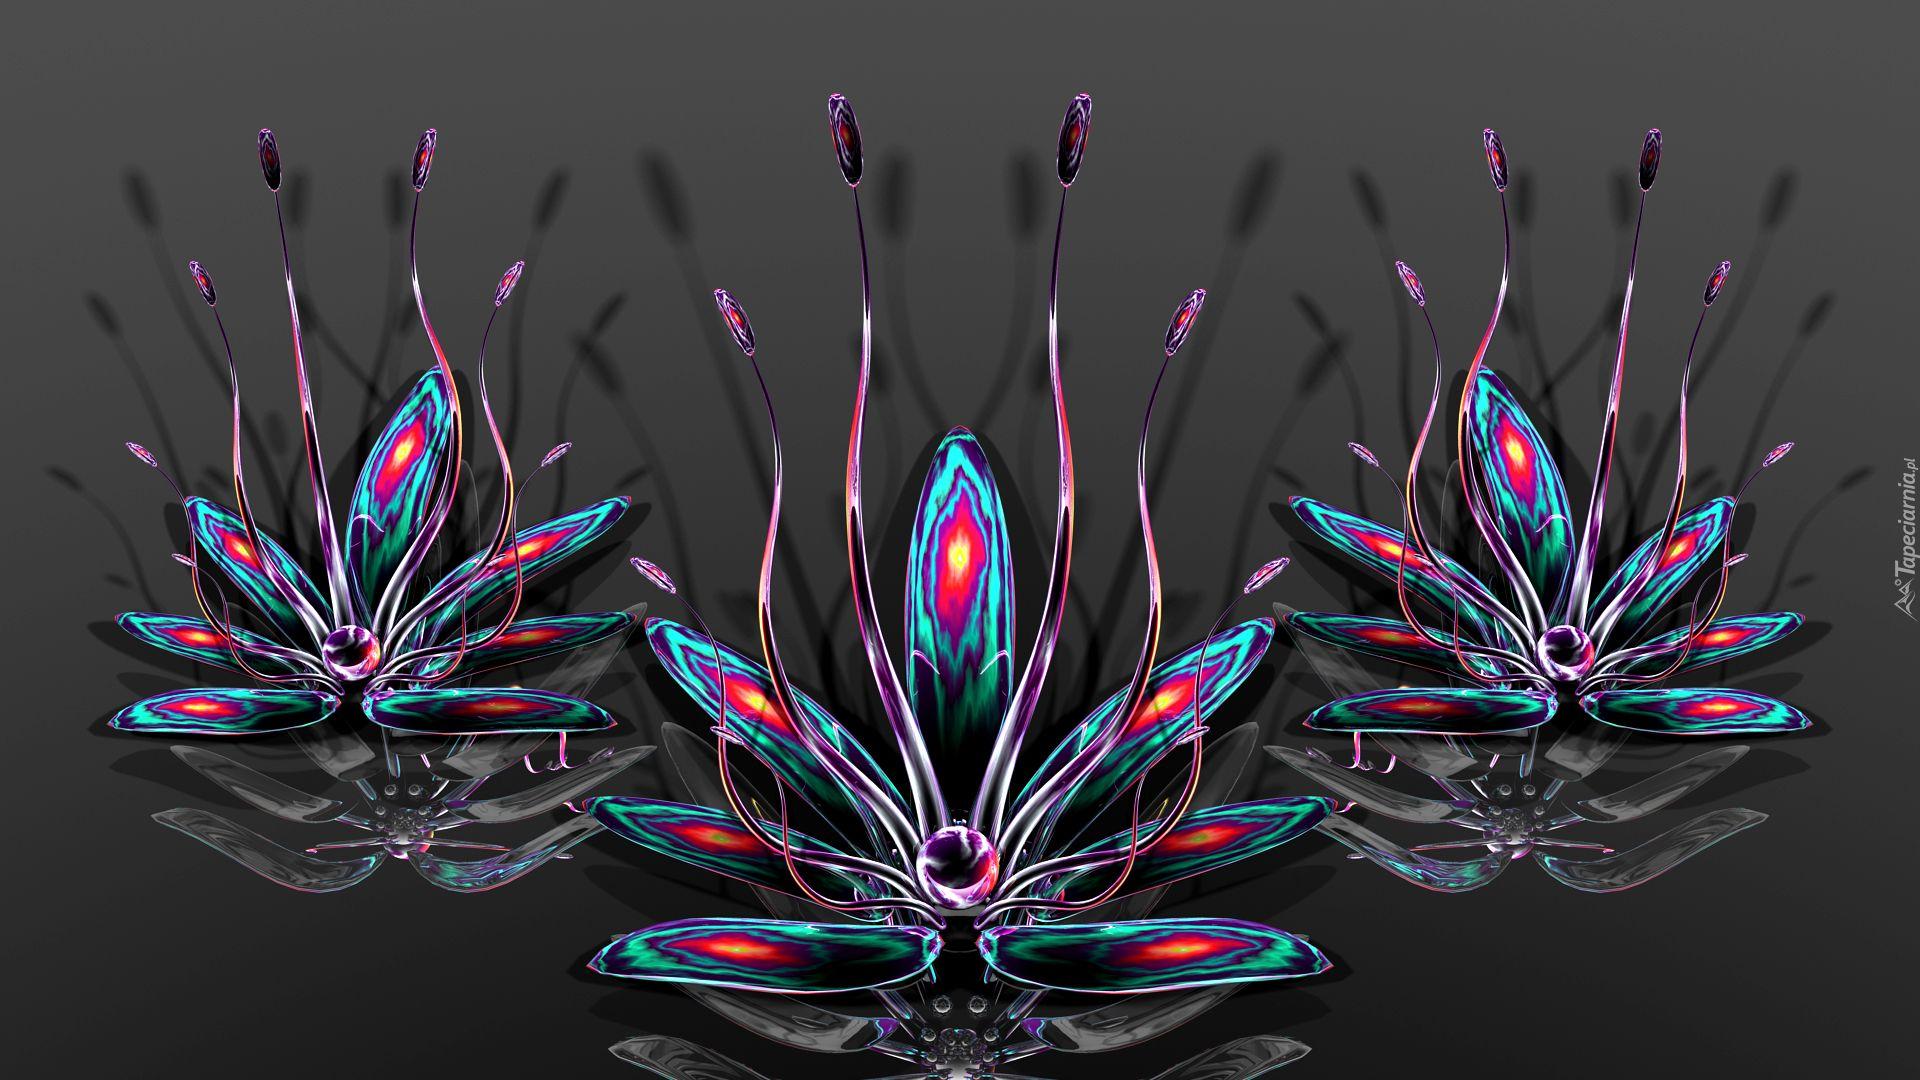 Grafika 3d Kwiaty Preciki Dyed Flowers Fractal Art Flowers